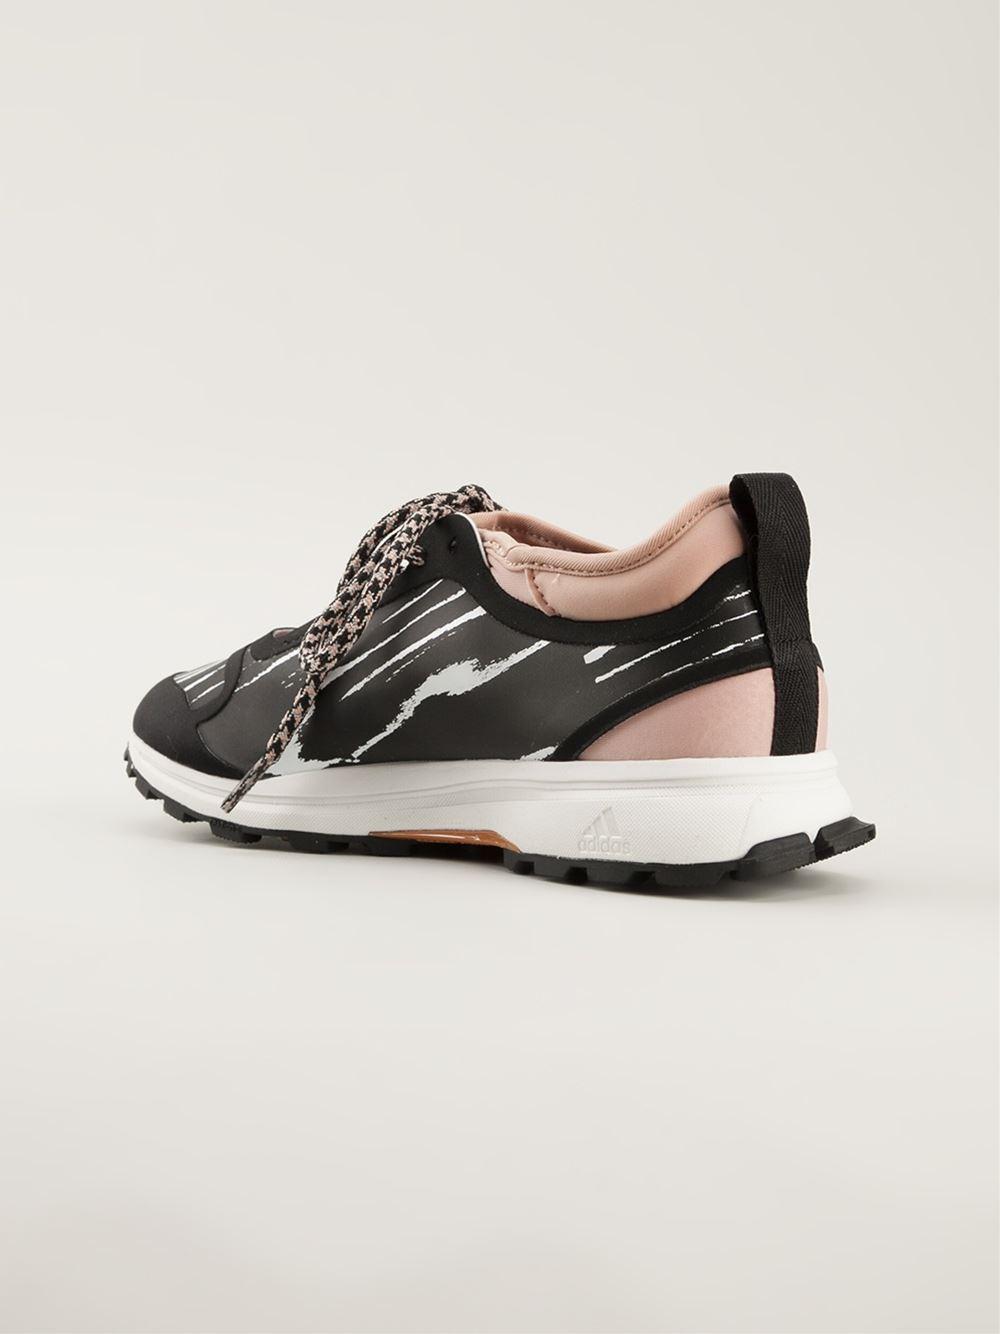 adidas by stella mccartney adizero xt sneakers black in black lyst. Black Bedroom Furniture Sets. Home Design Ideas